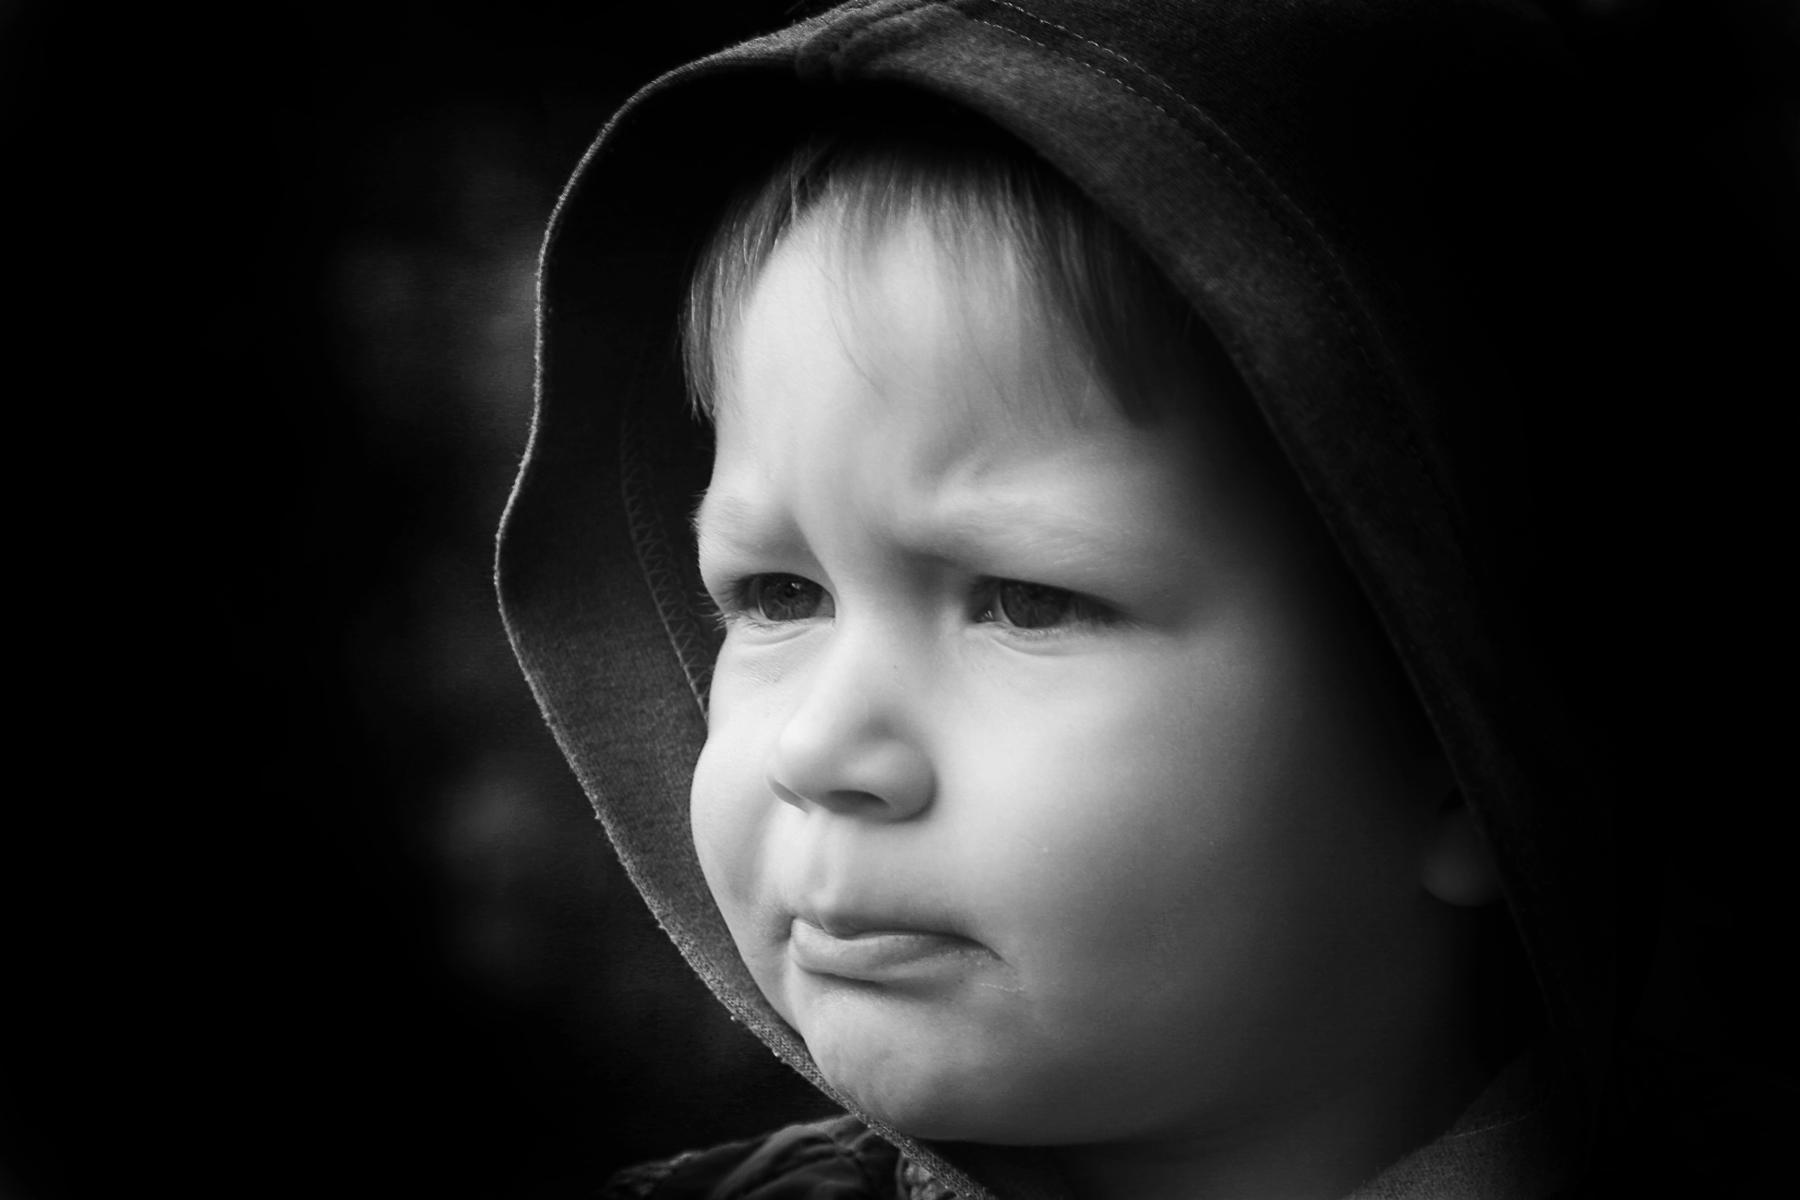 фото ребёнка чёрно-белое